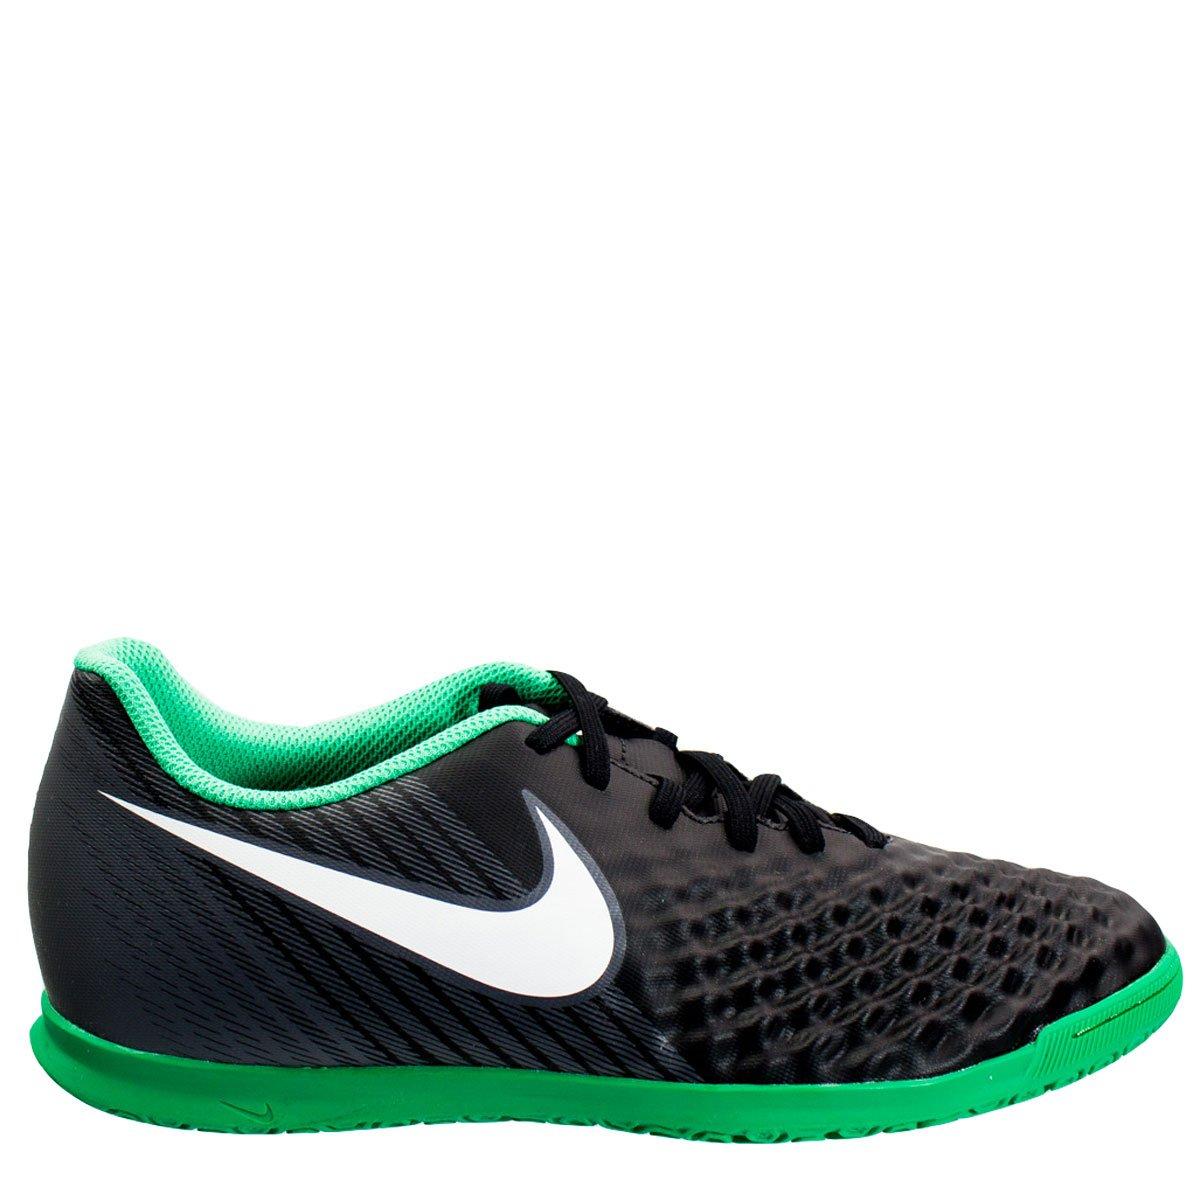 8f97815fb6c6b Bizz Store - Chuteira de Futsal Masculina Nike Magista Ola II IC